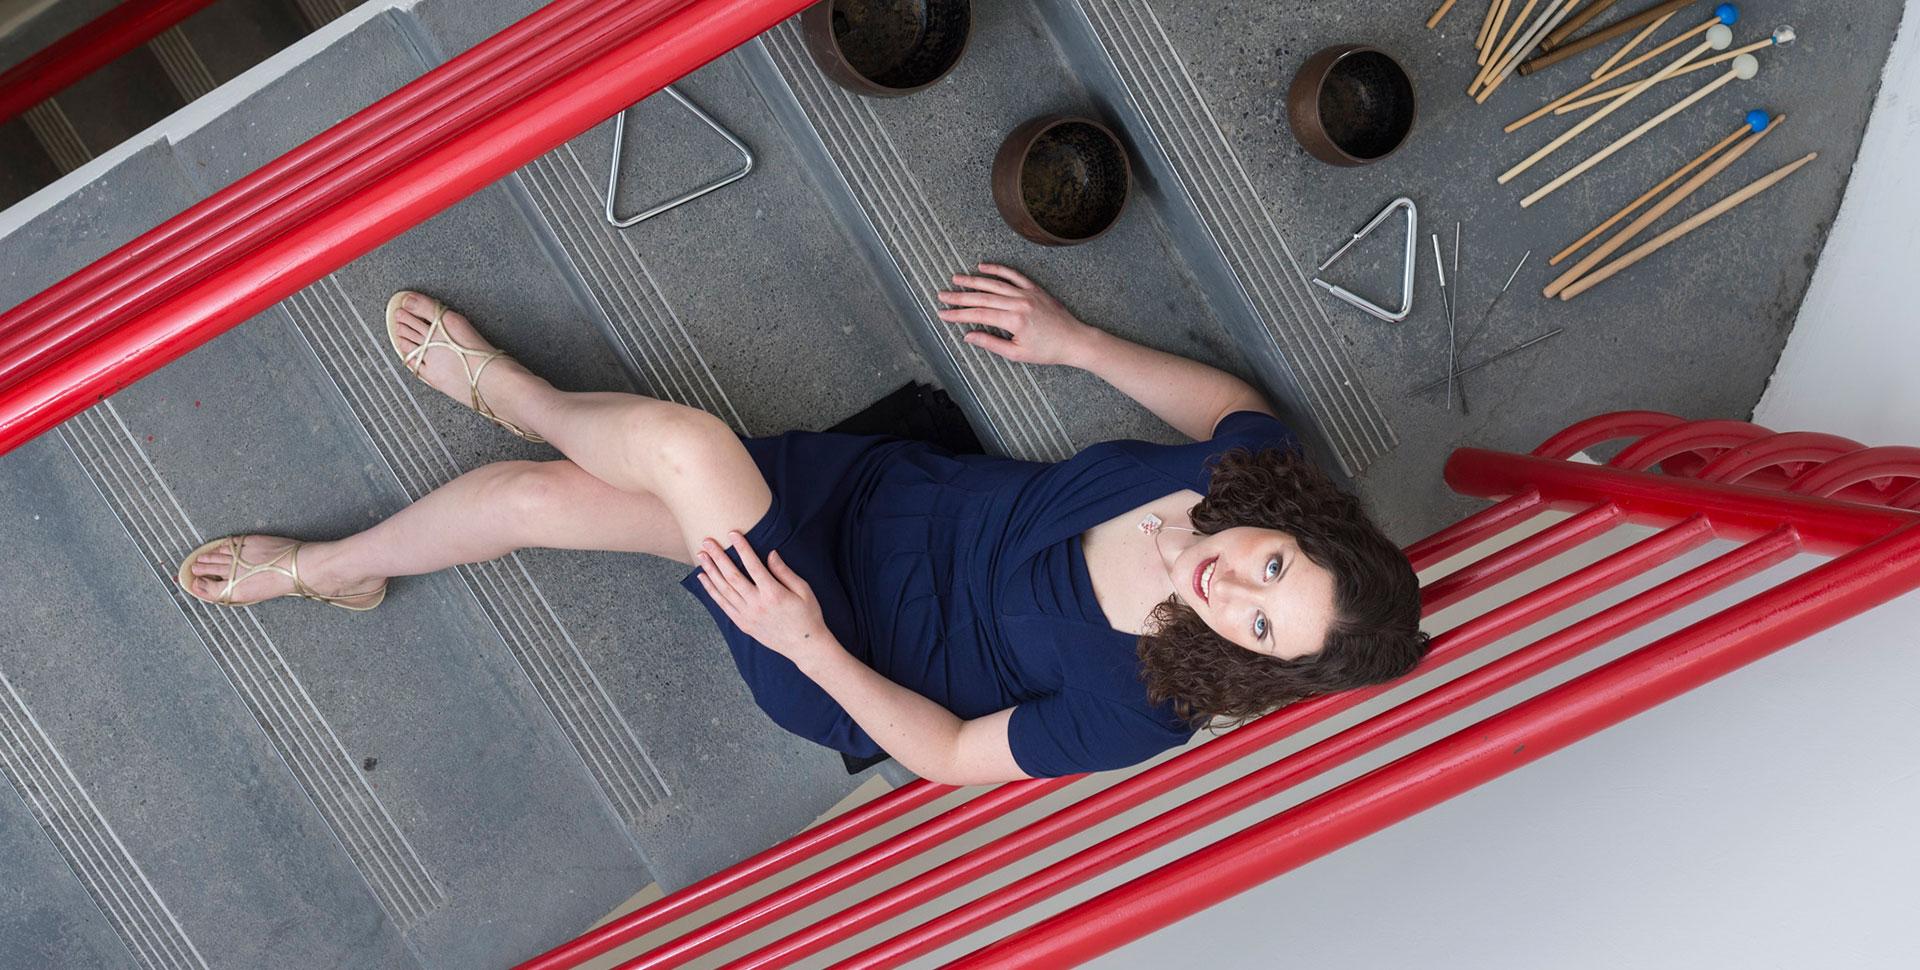 Katie stairs